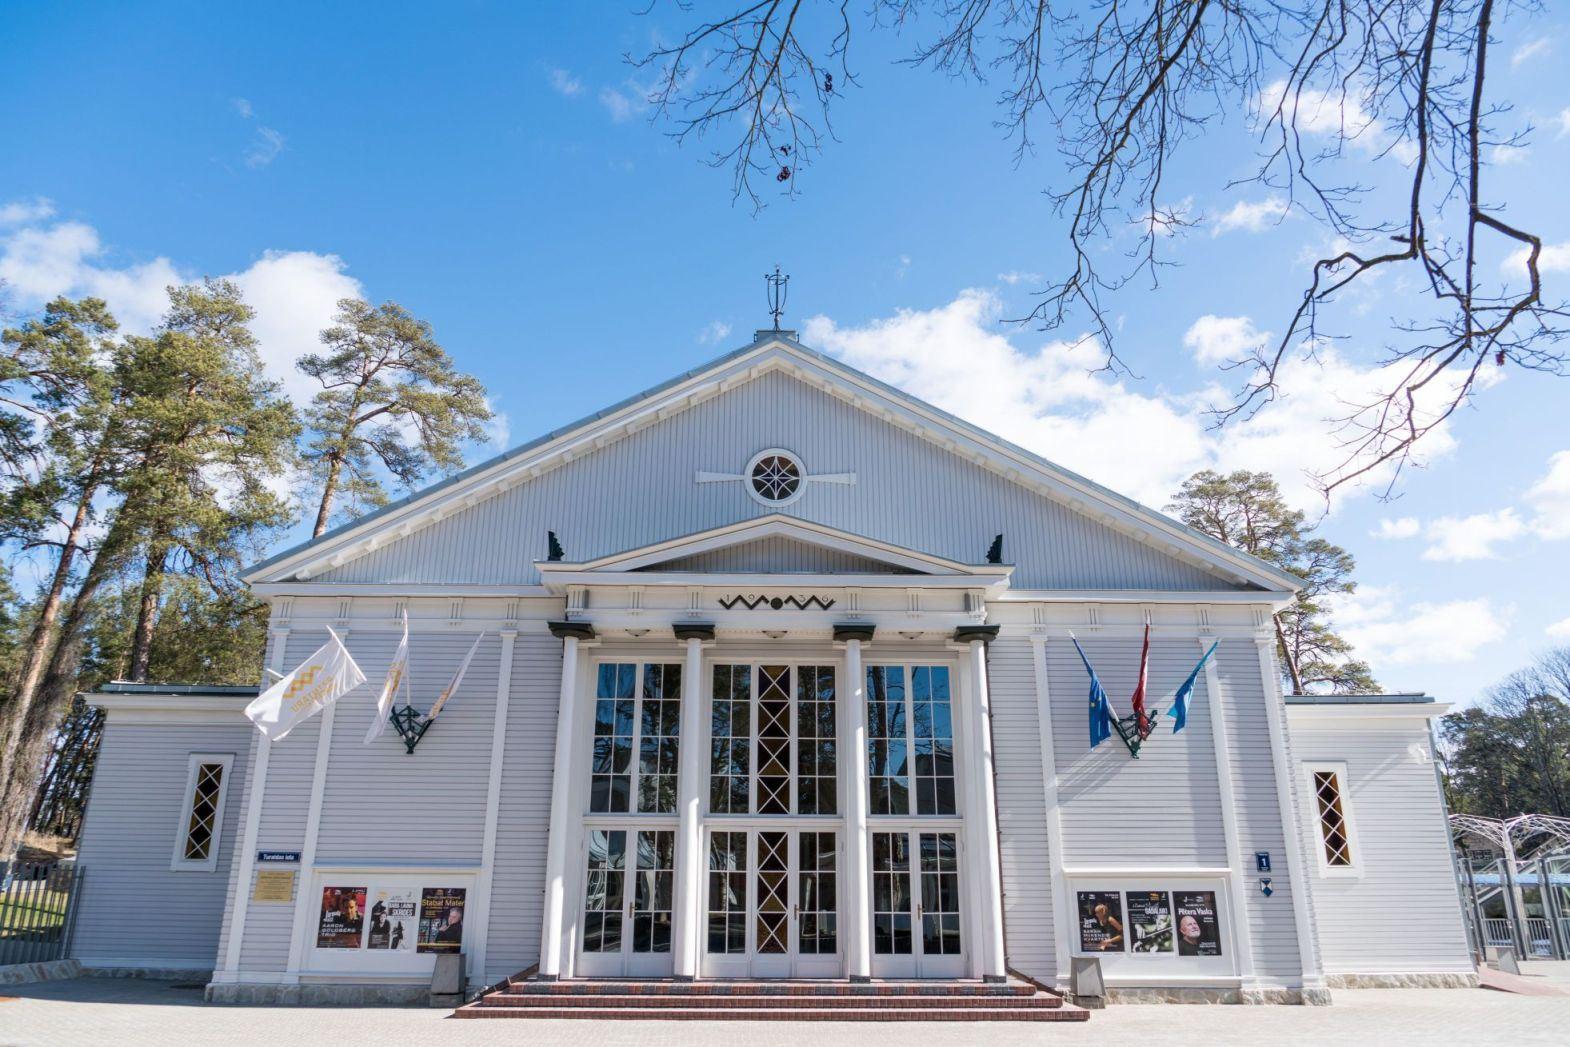 © https://www.dzintarukoncertzale.lv, Dzintari Concert Hall